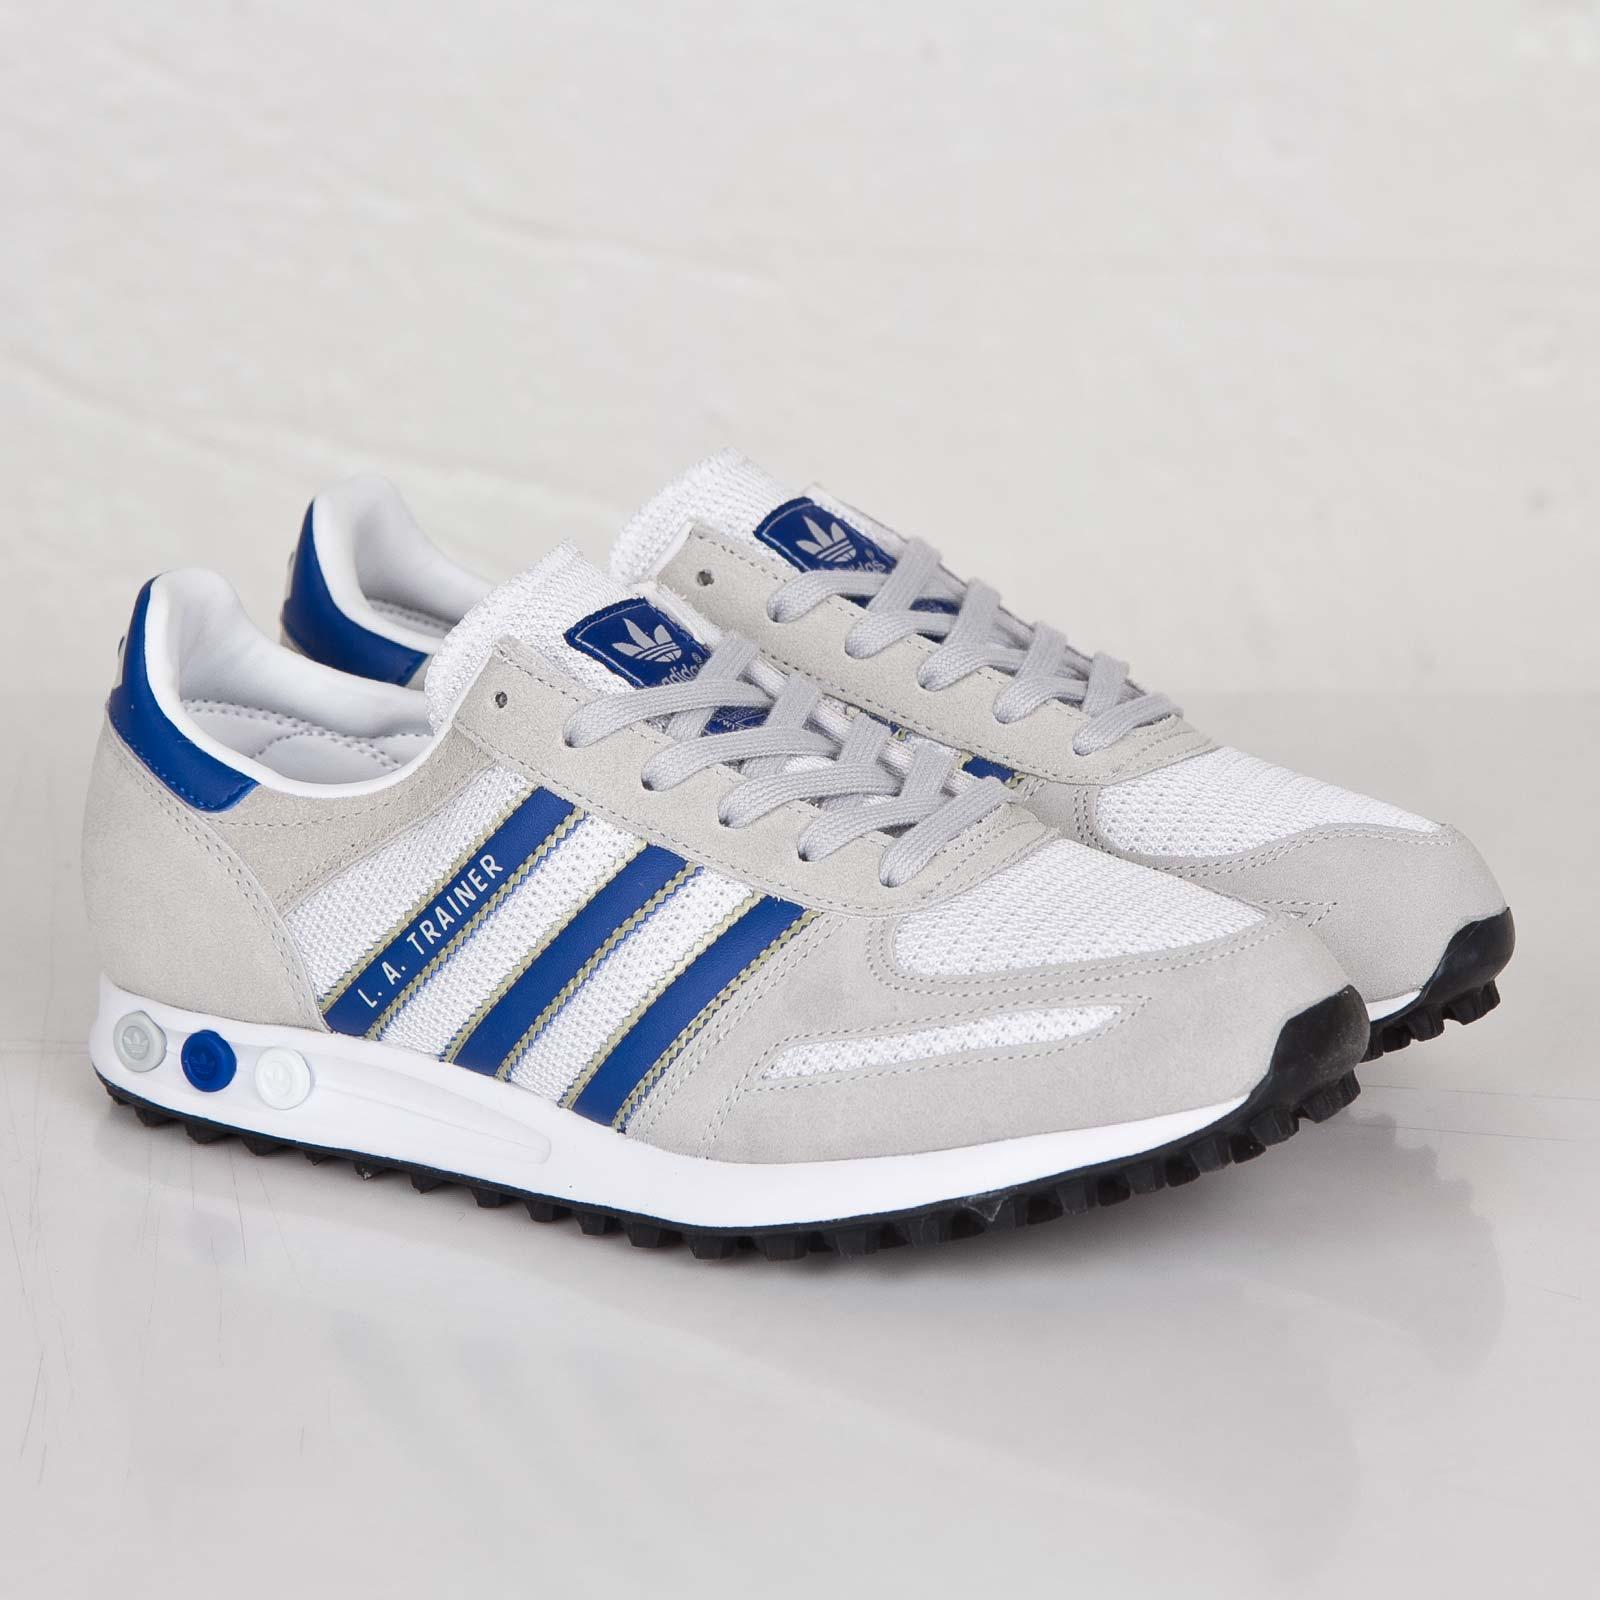 adidas LA Trainer - M29506 - Sneakersnstuff | sneakers ...